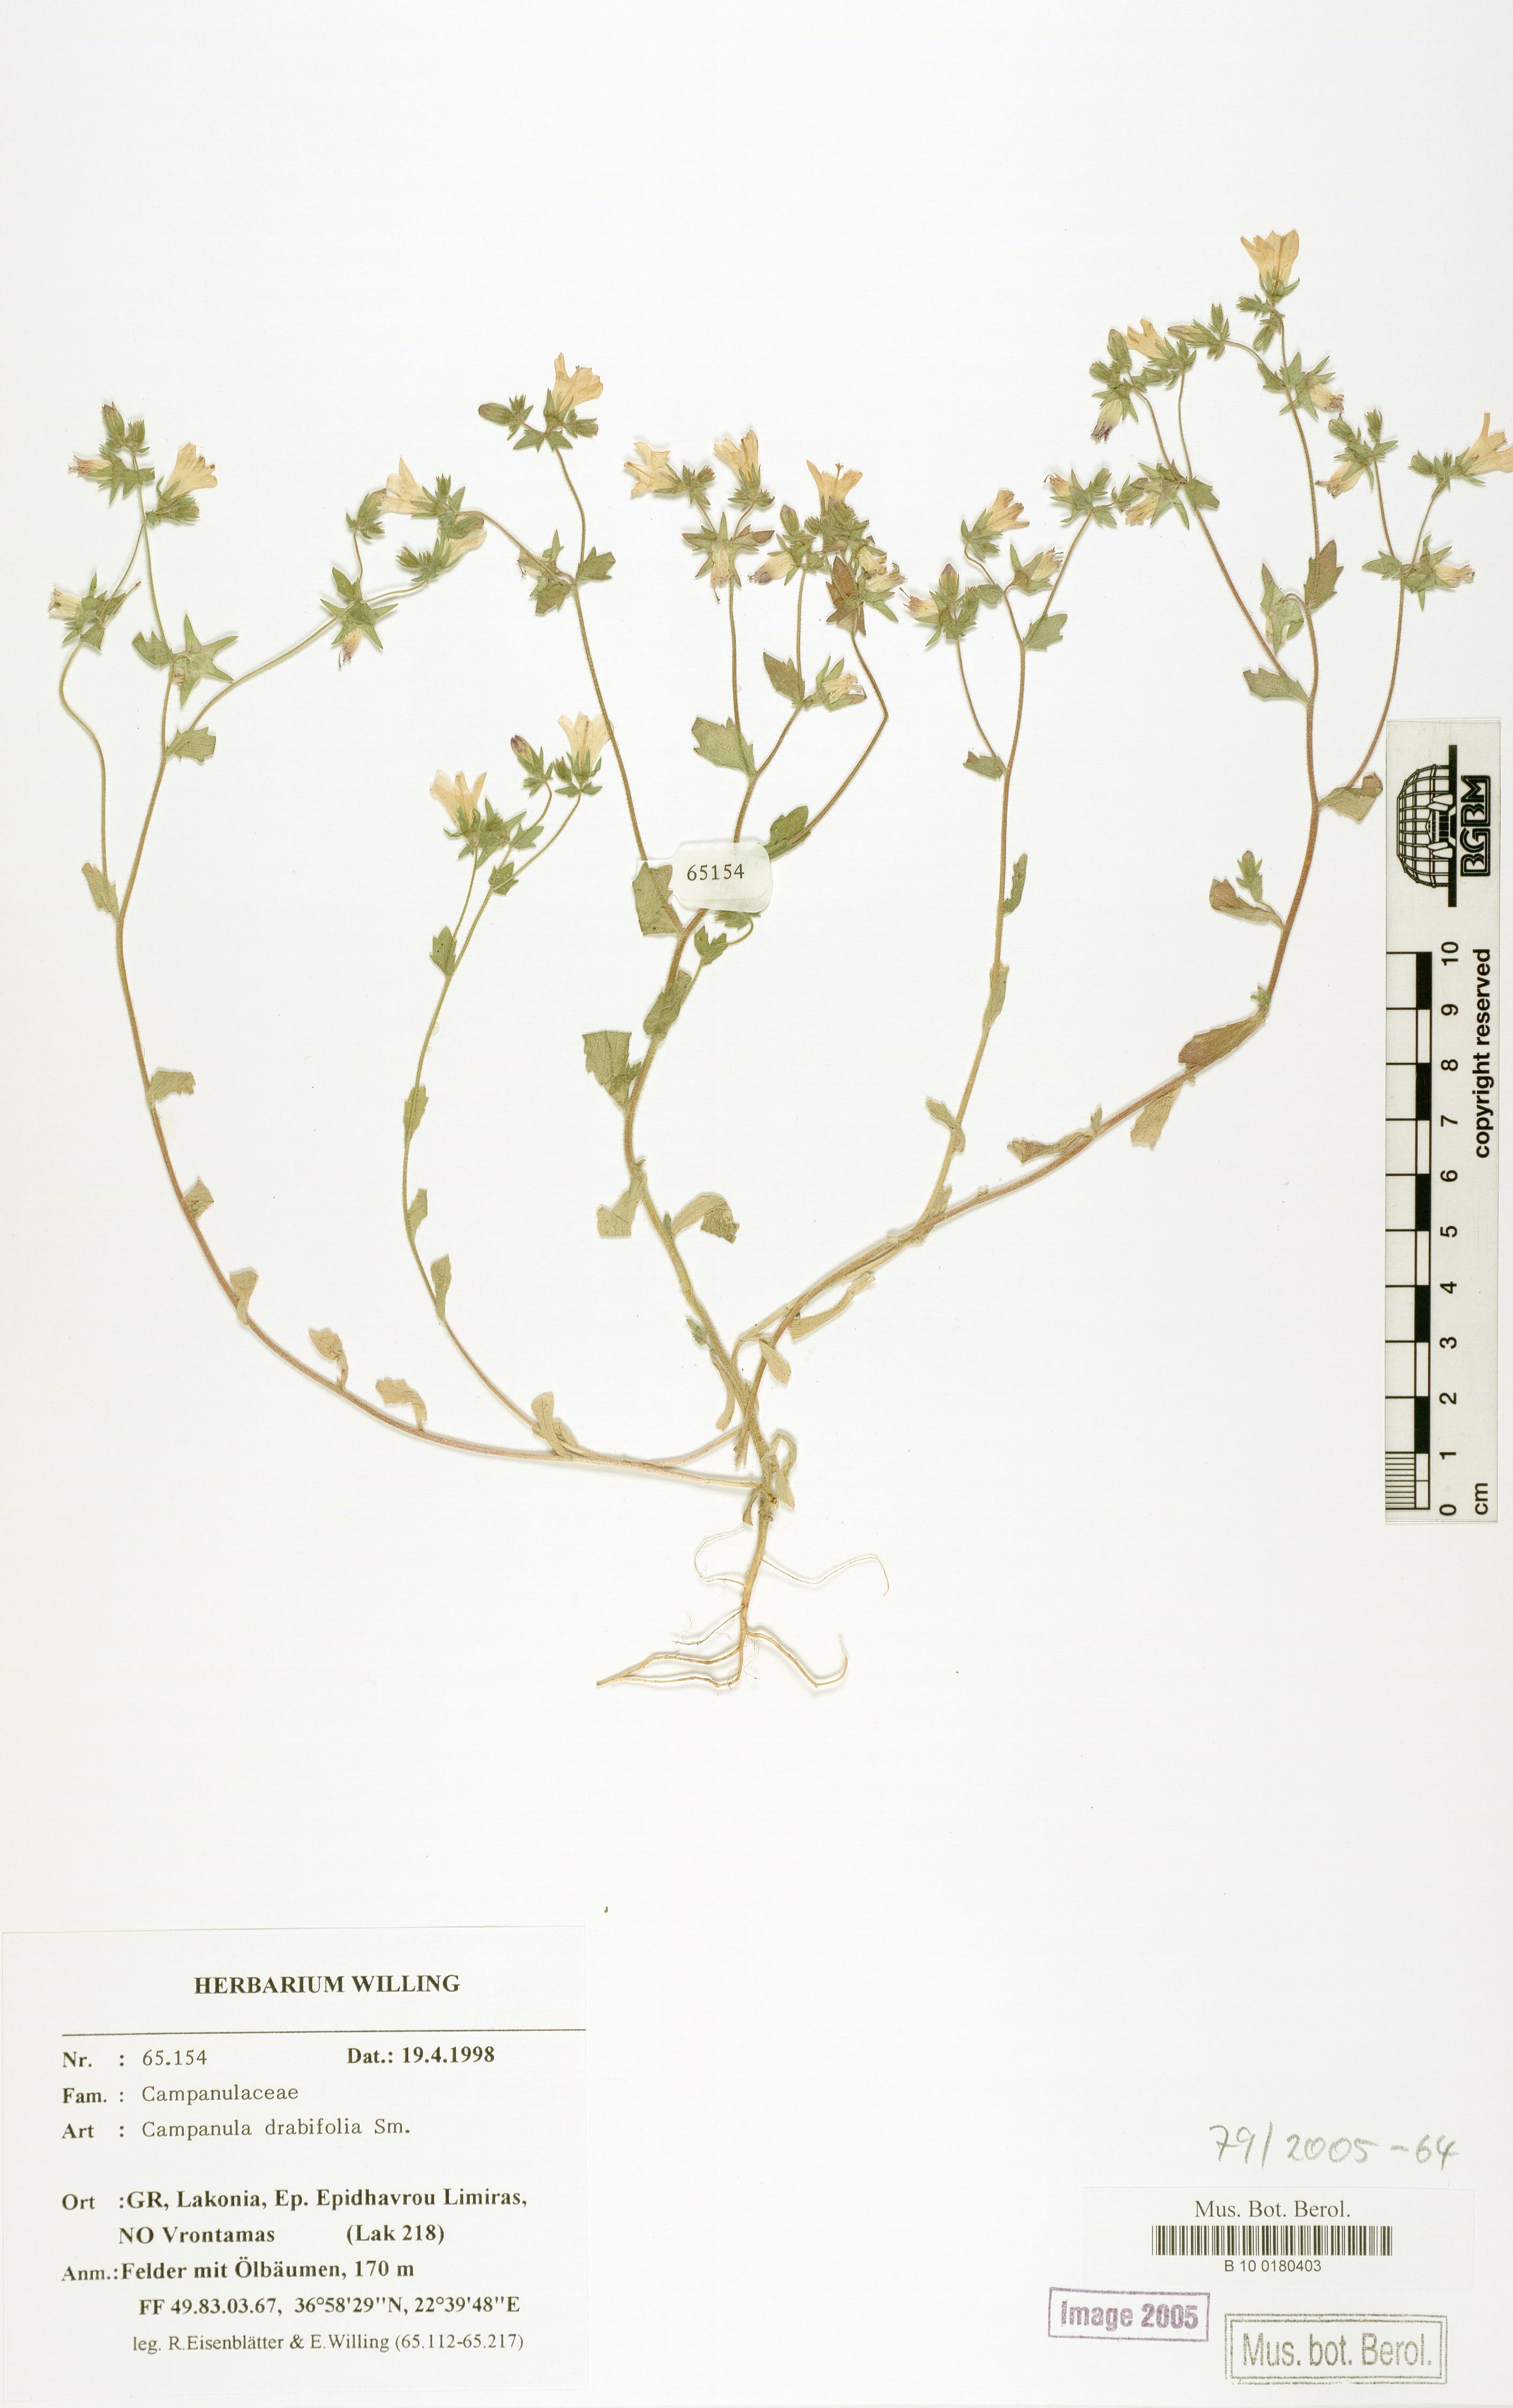 http://ww2.bgbm.org/herbarium/images/B/10/01/80/40/B_10_0180403.jpg